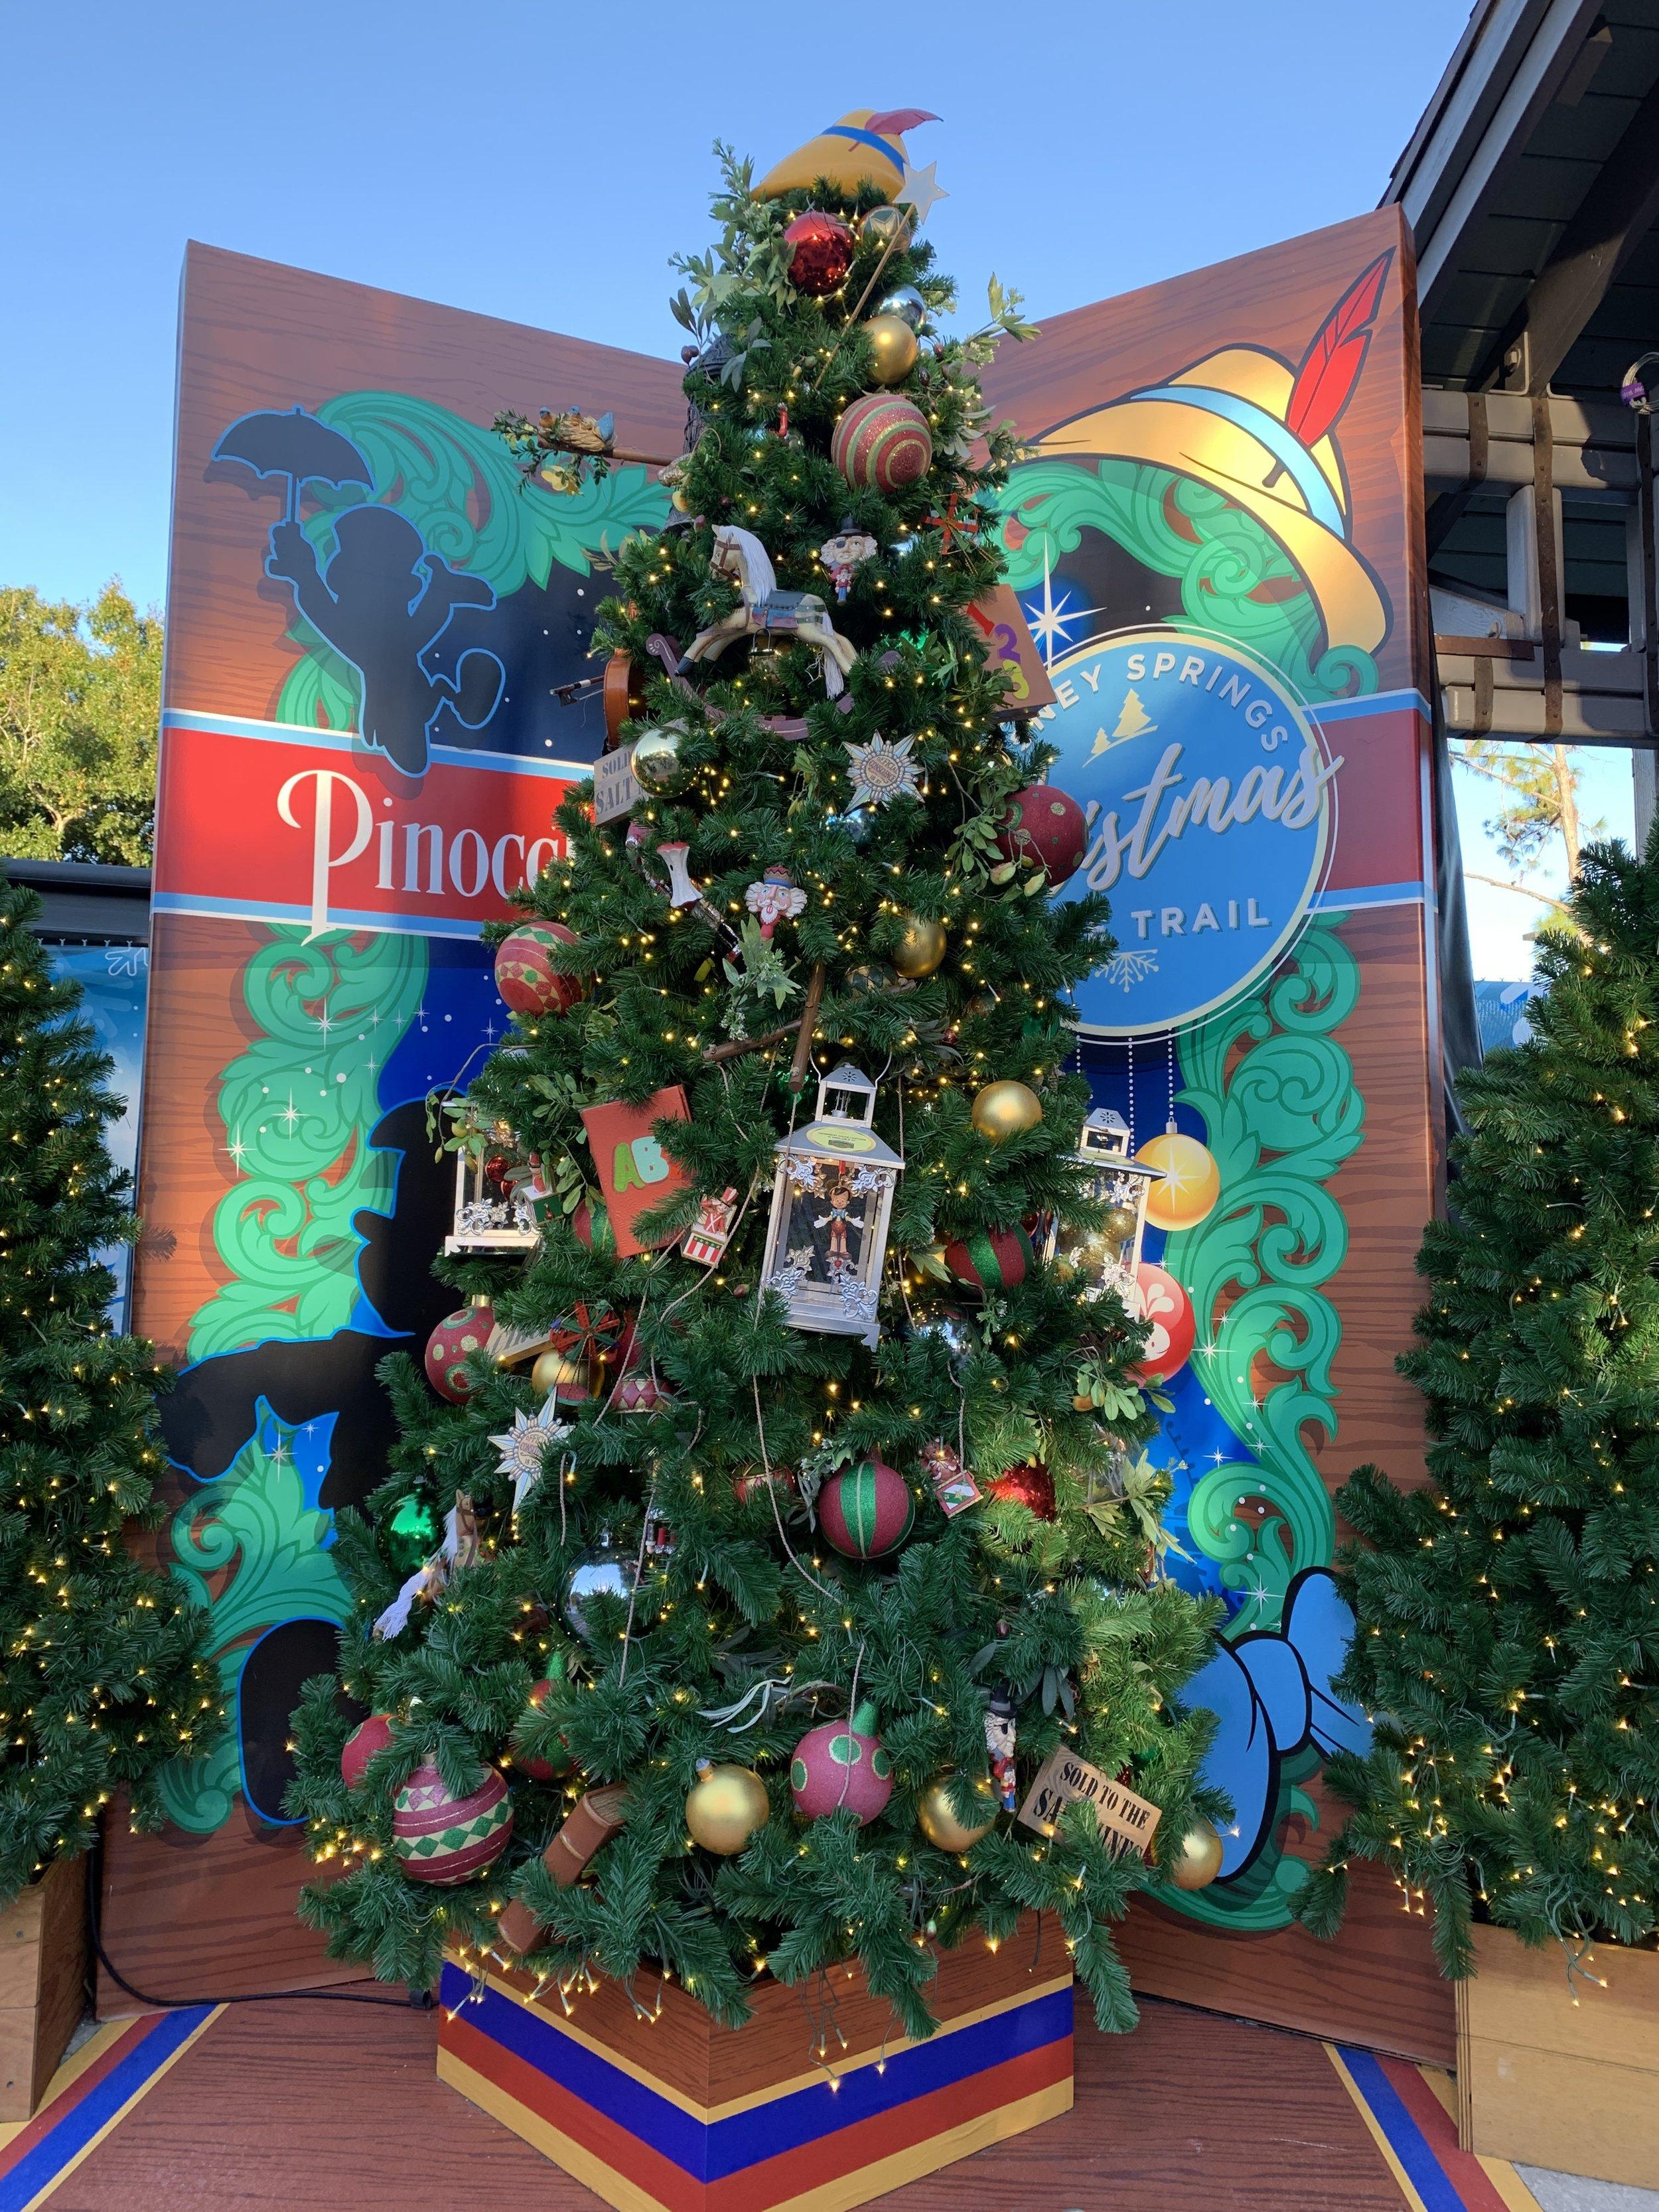 Pinocchio's Tree